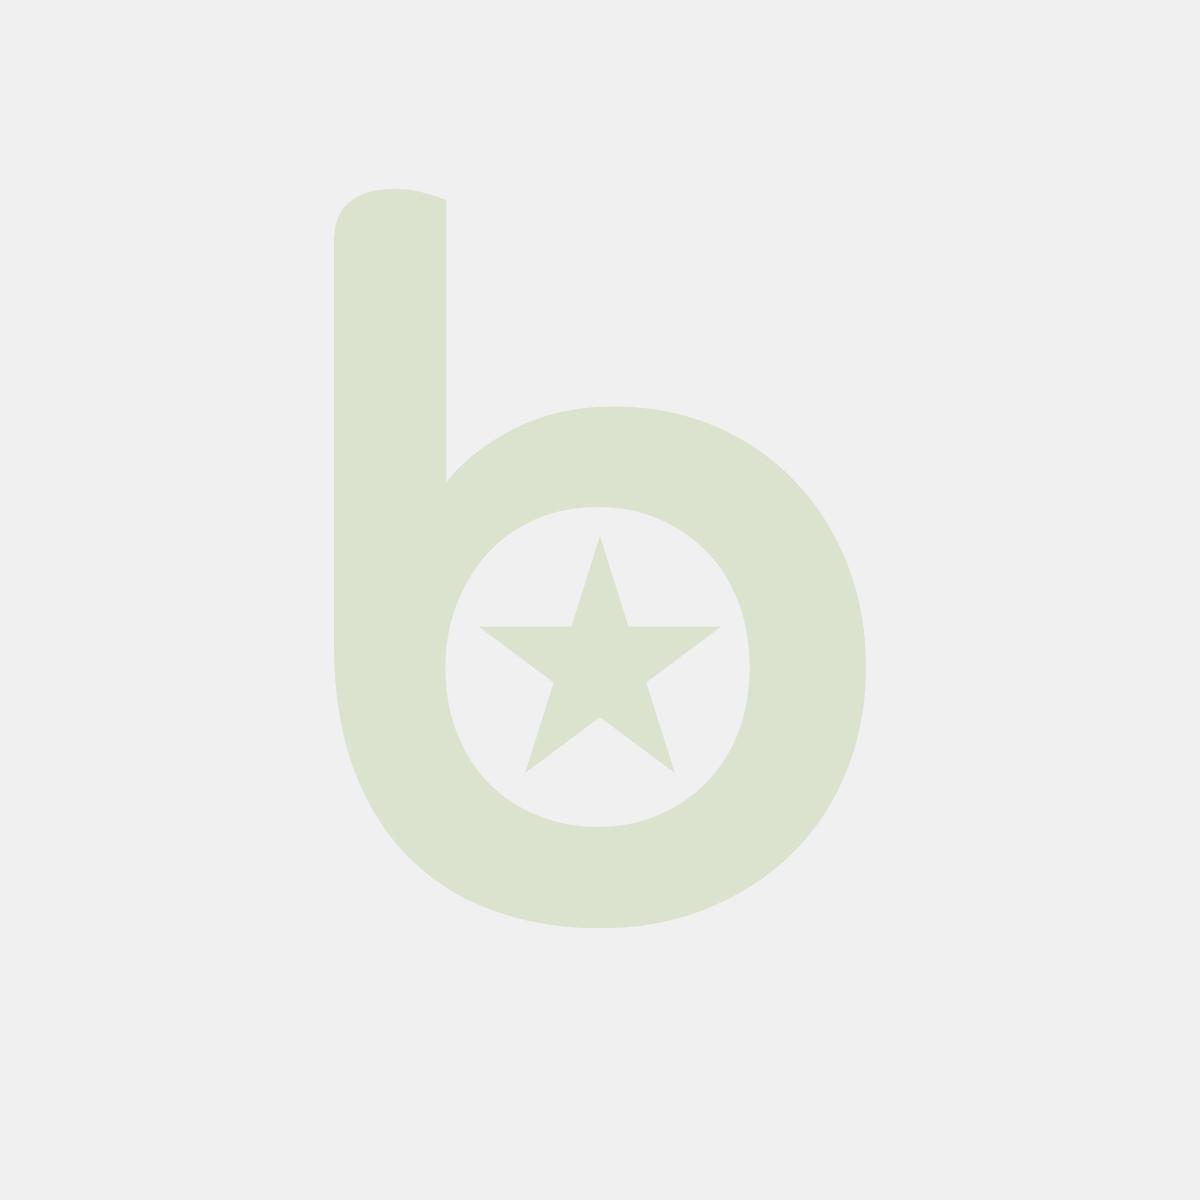 Torby i torebki Opakowania papierowe Opakowania BAGSTAR